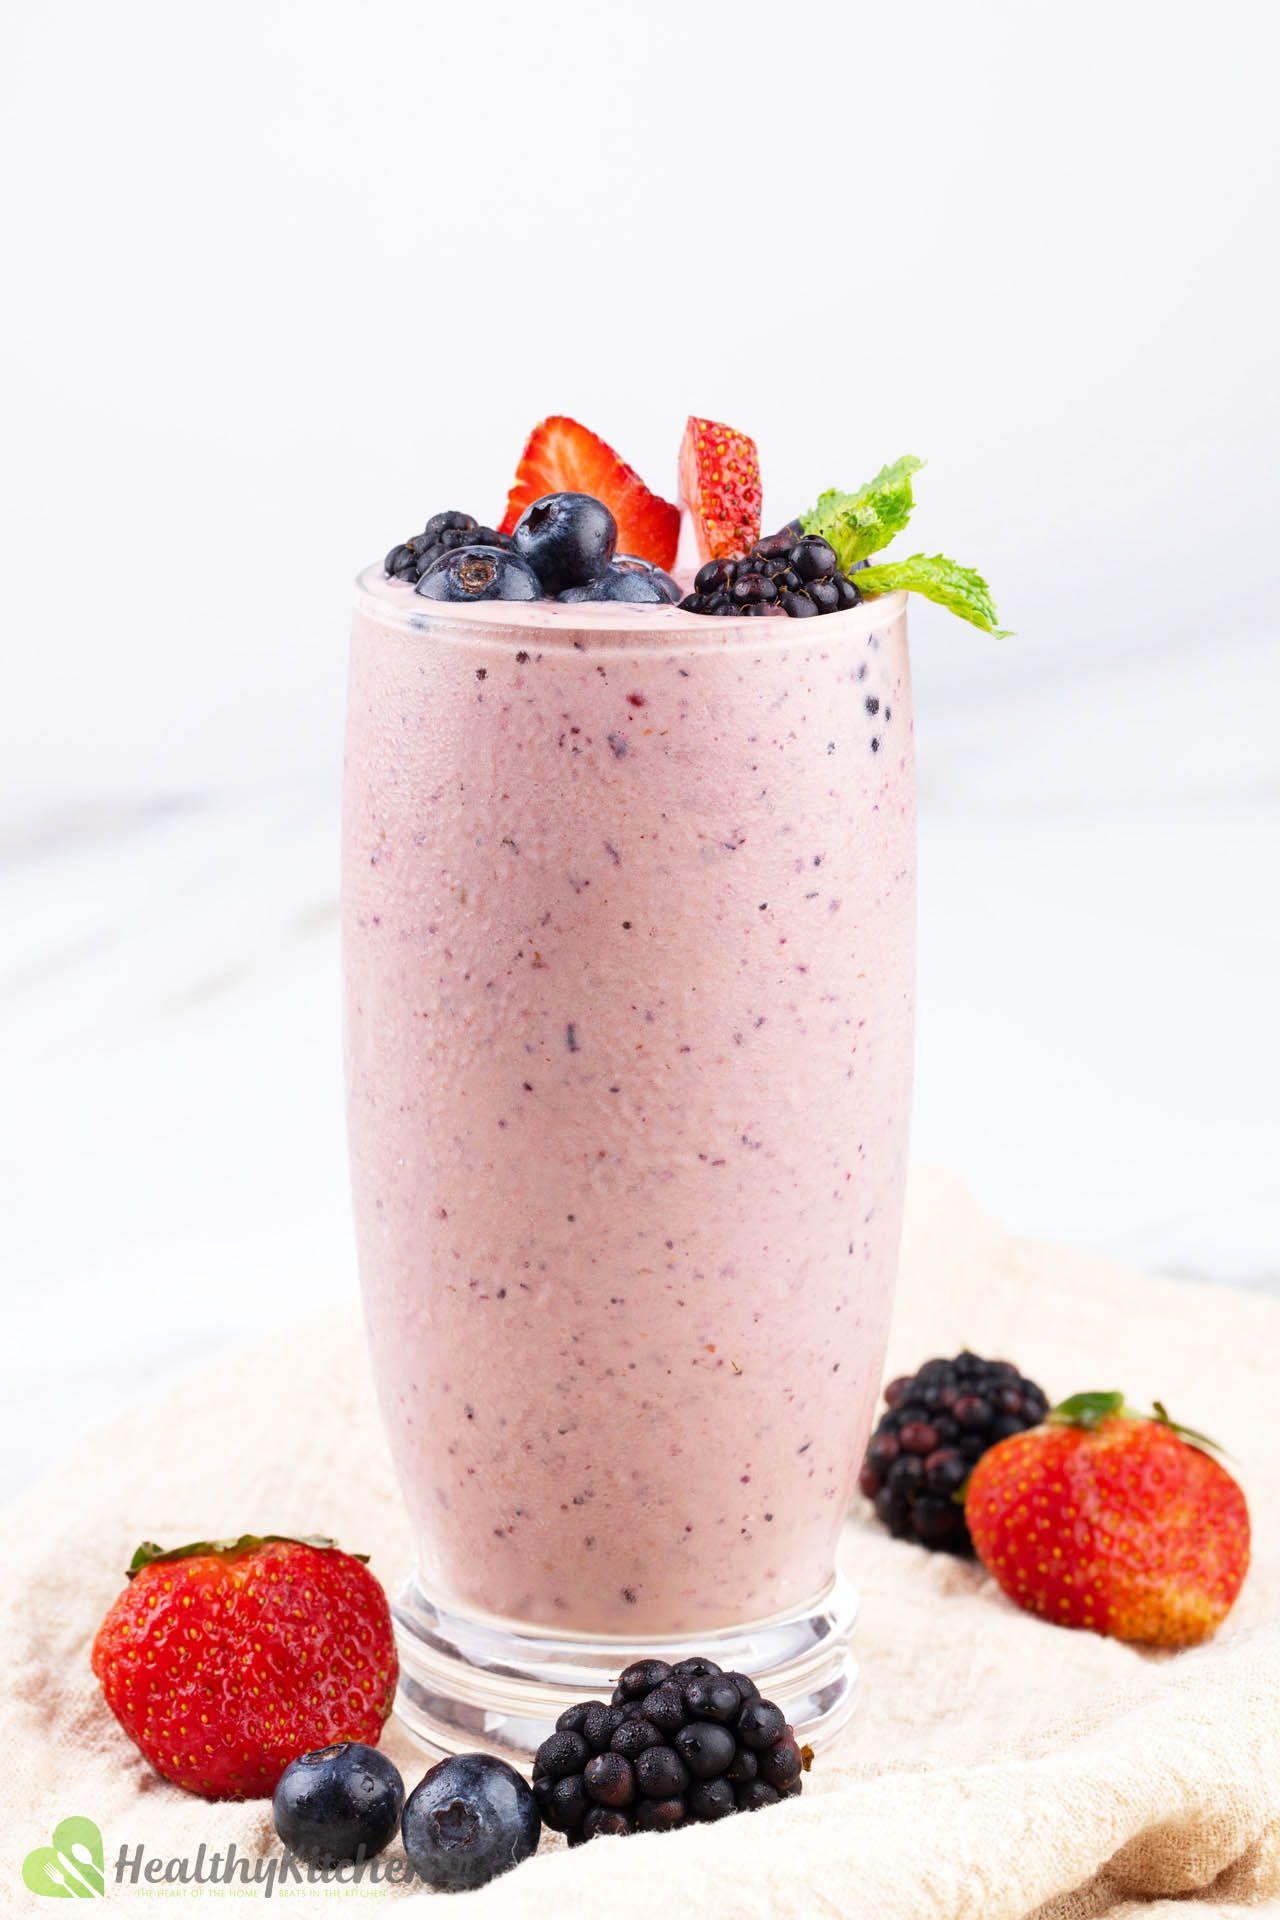 Frozen Fruit Smoothie Recipe - A Refreshing Berry-Mango Summer Blend